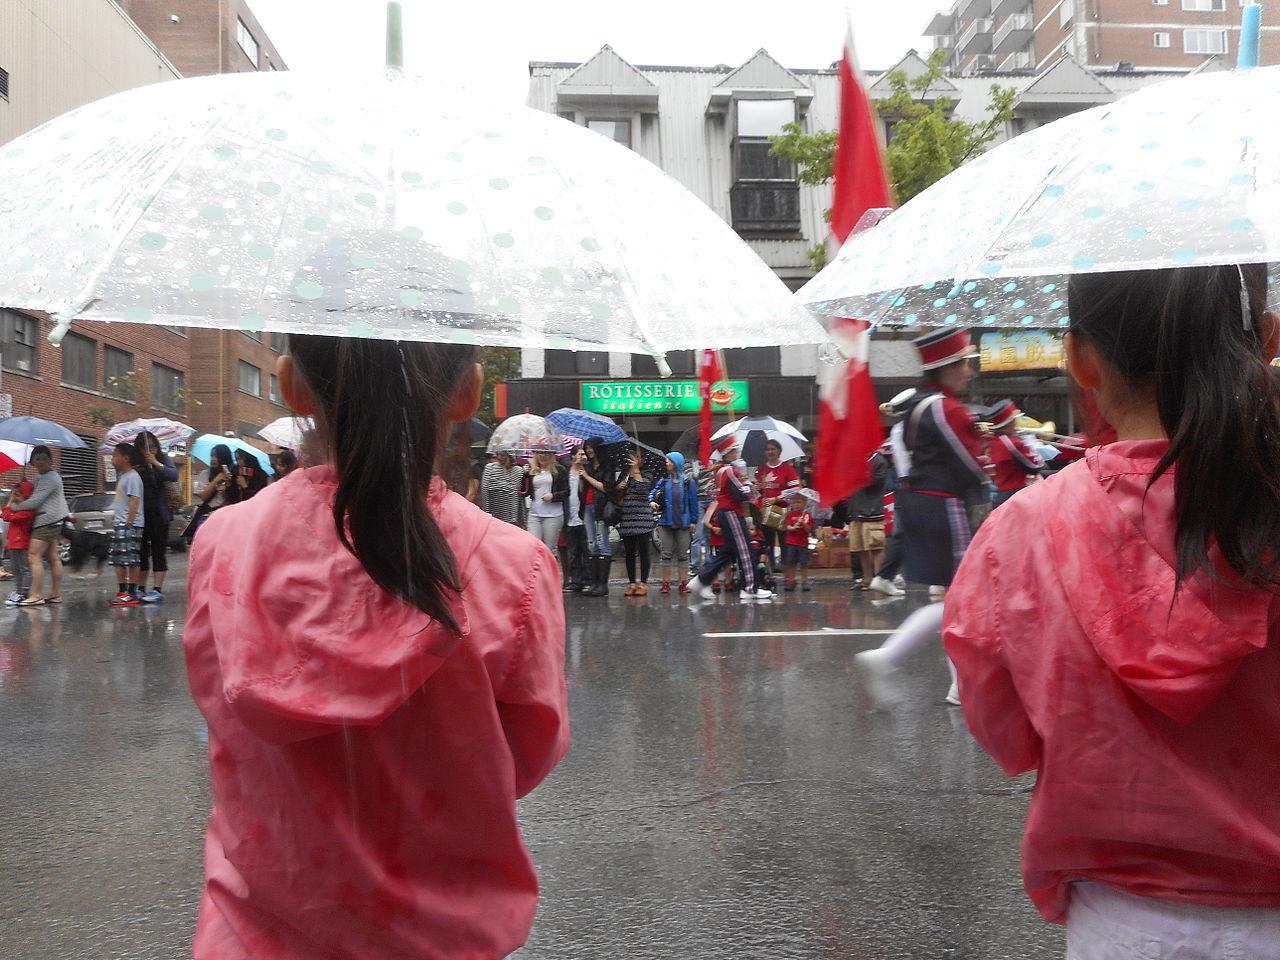 File:Canada Day 2015 on Saint Catherine Street - 229.jpg - Wikimedia